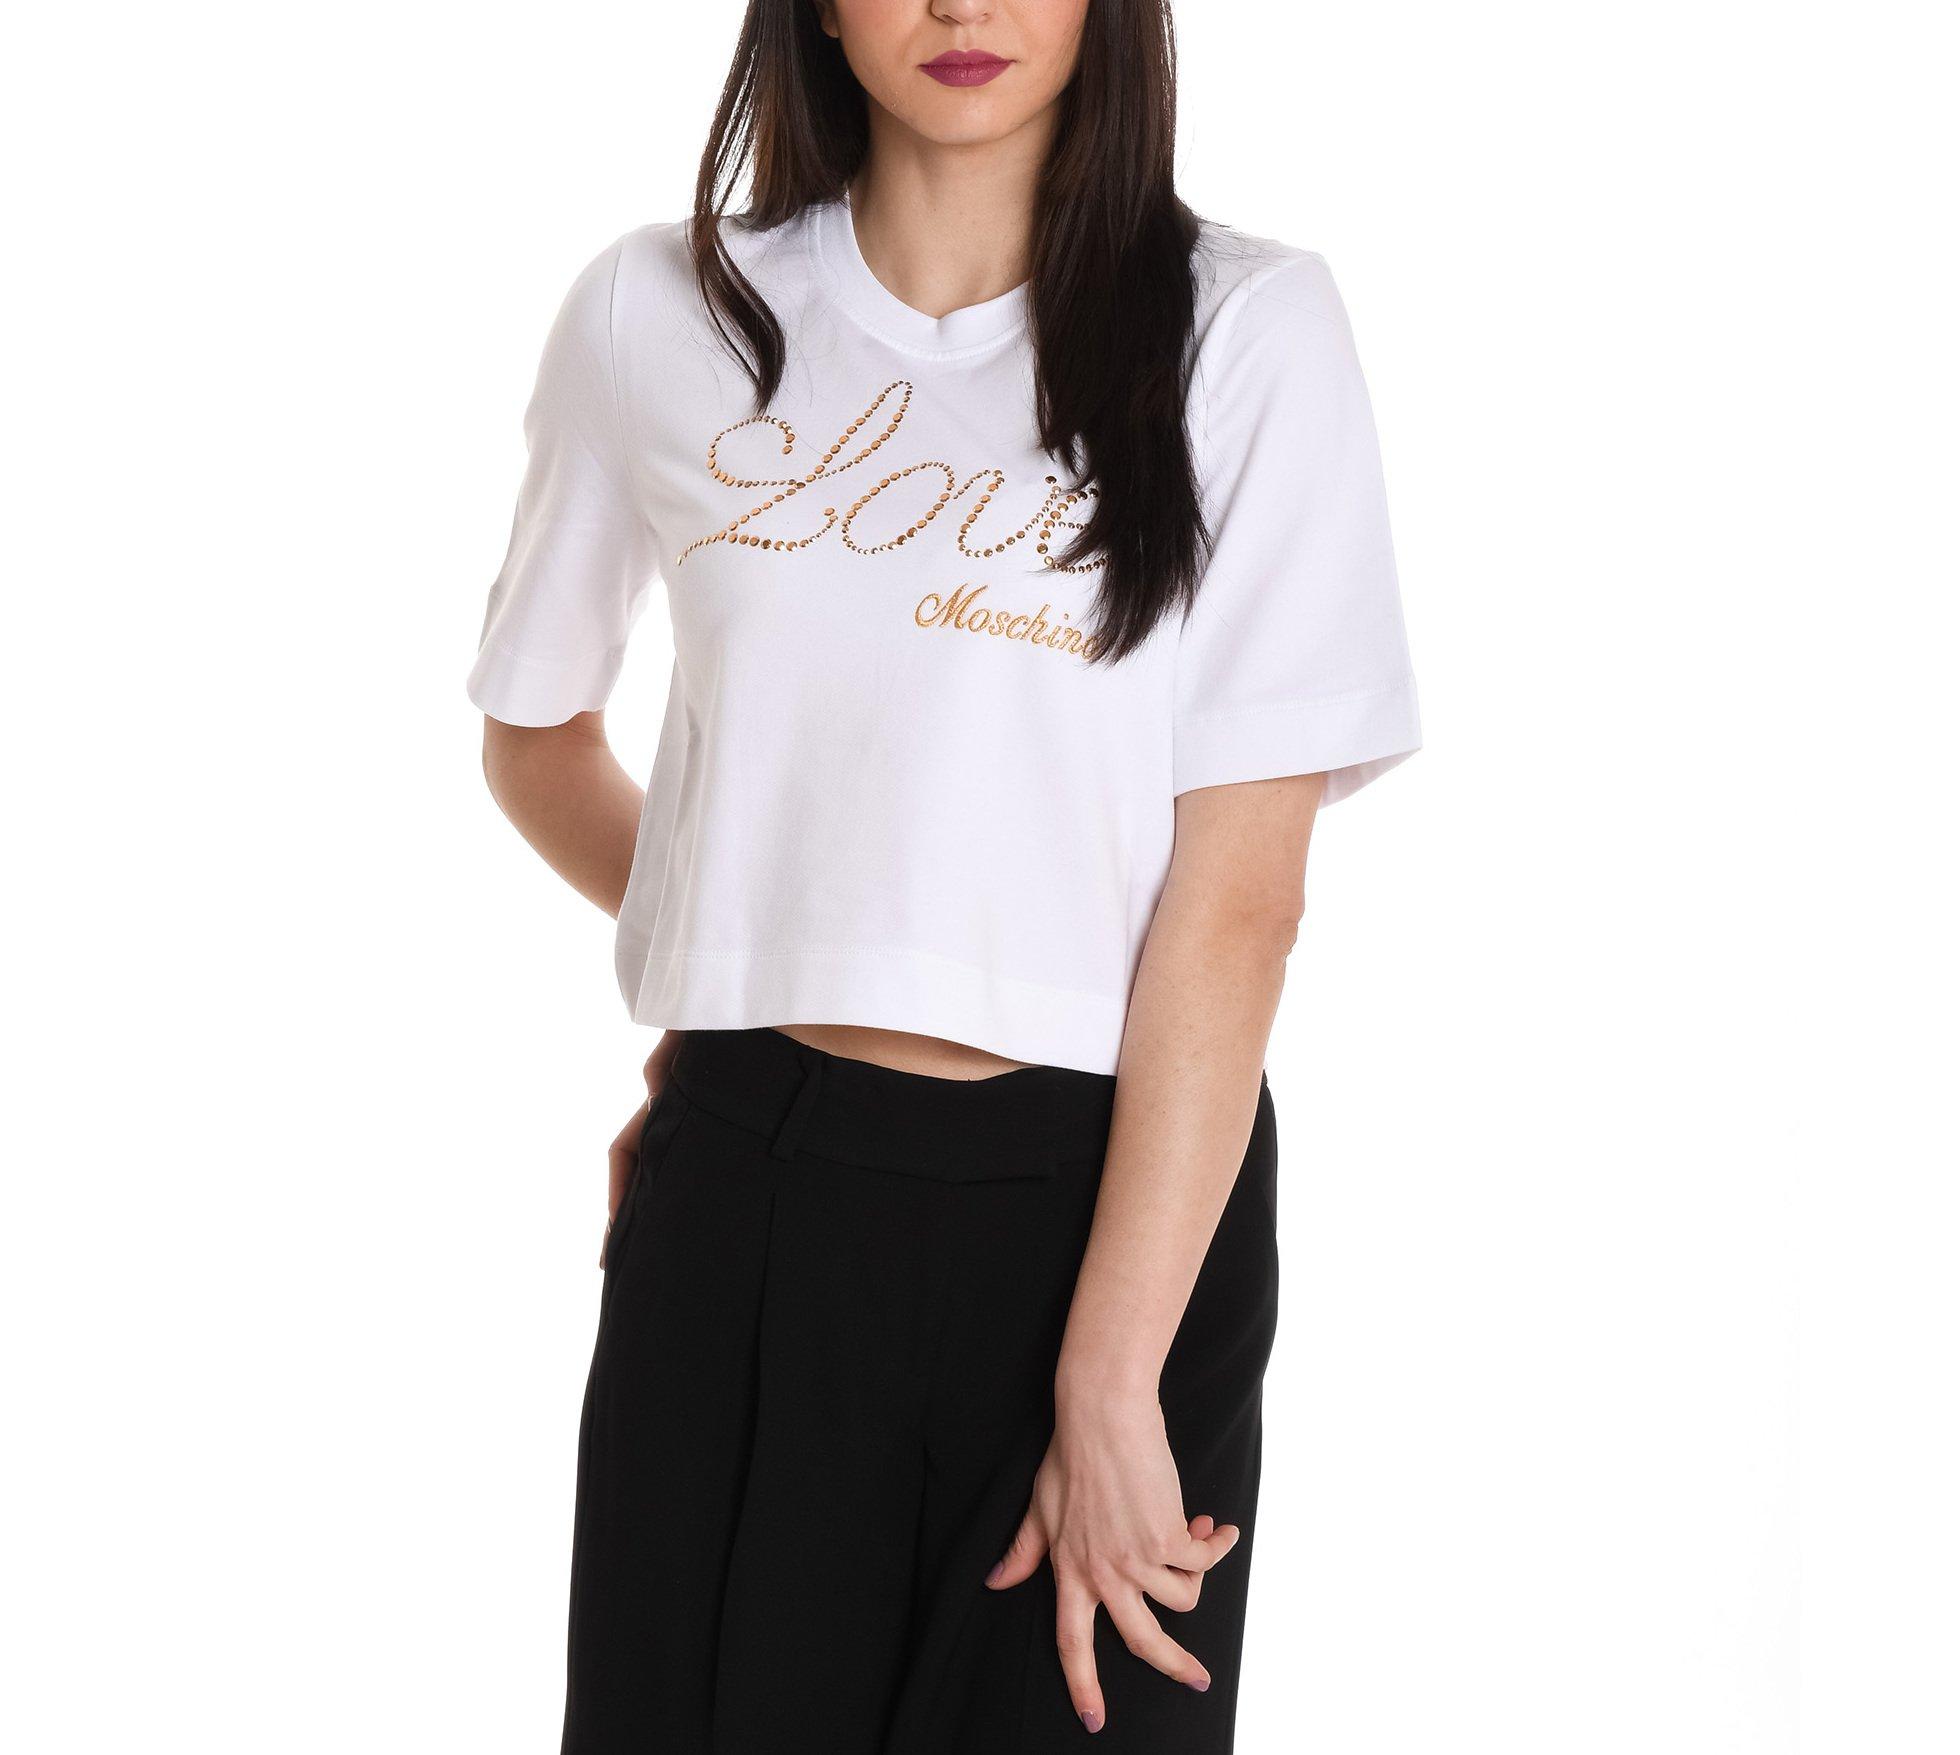 Love Moschino Women's W628604e1762a00 White Cotton T-Shirt